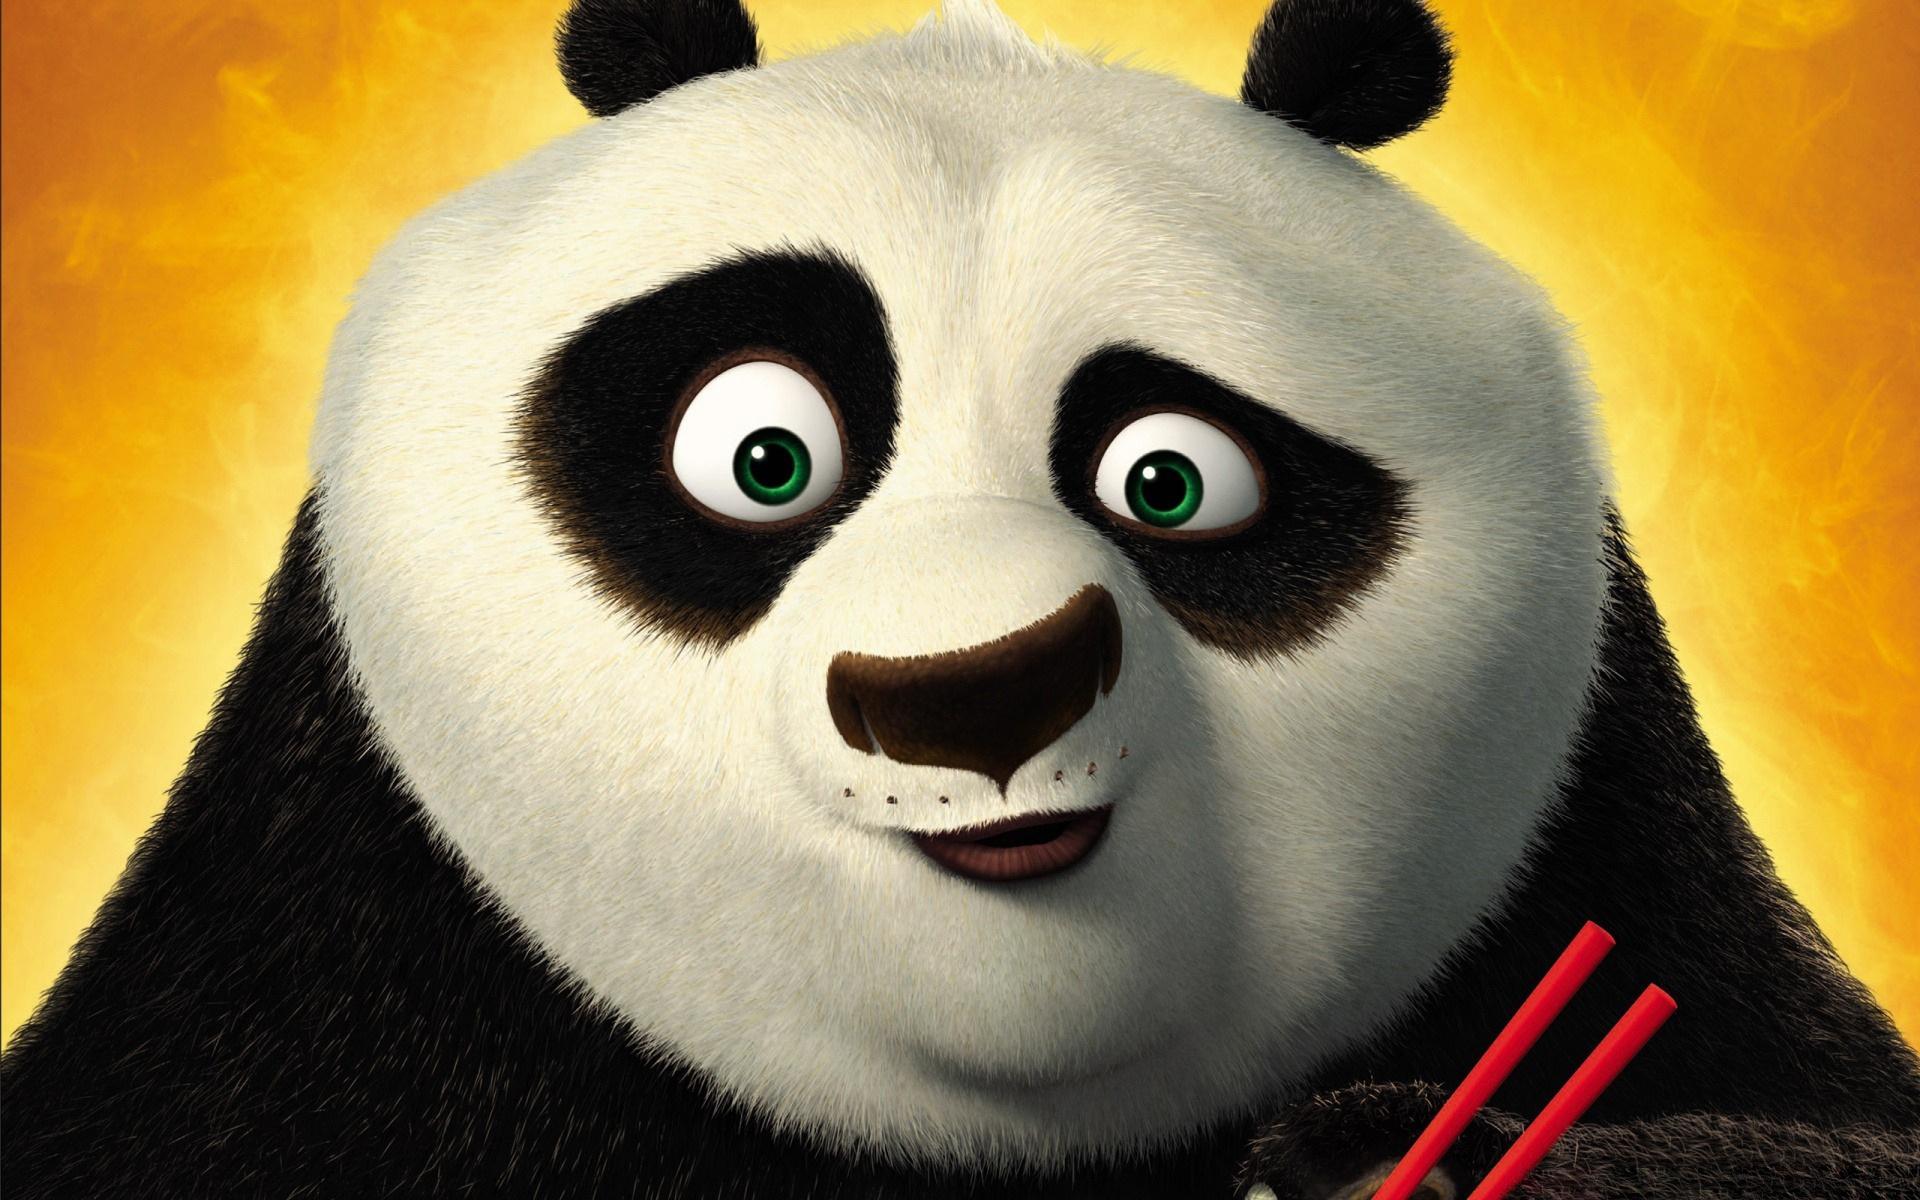 Free Download Kung Fu Panda 2 Wallpaper 551096 1920x1200 For